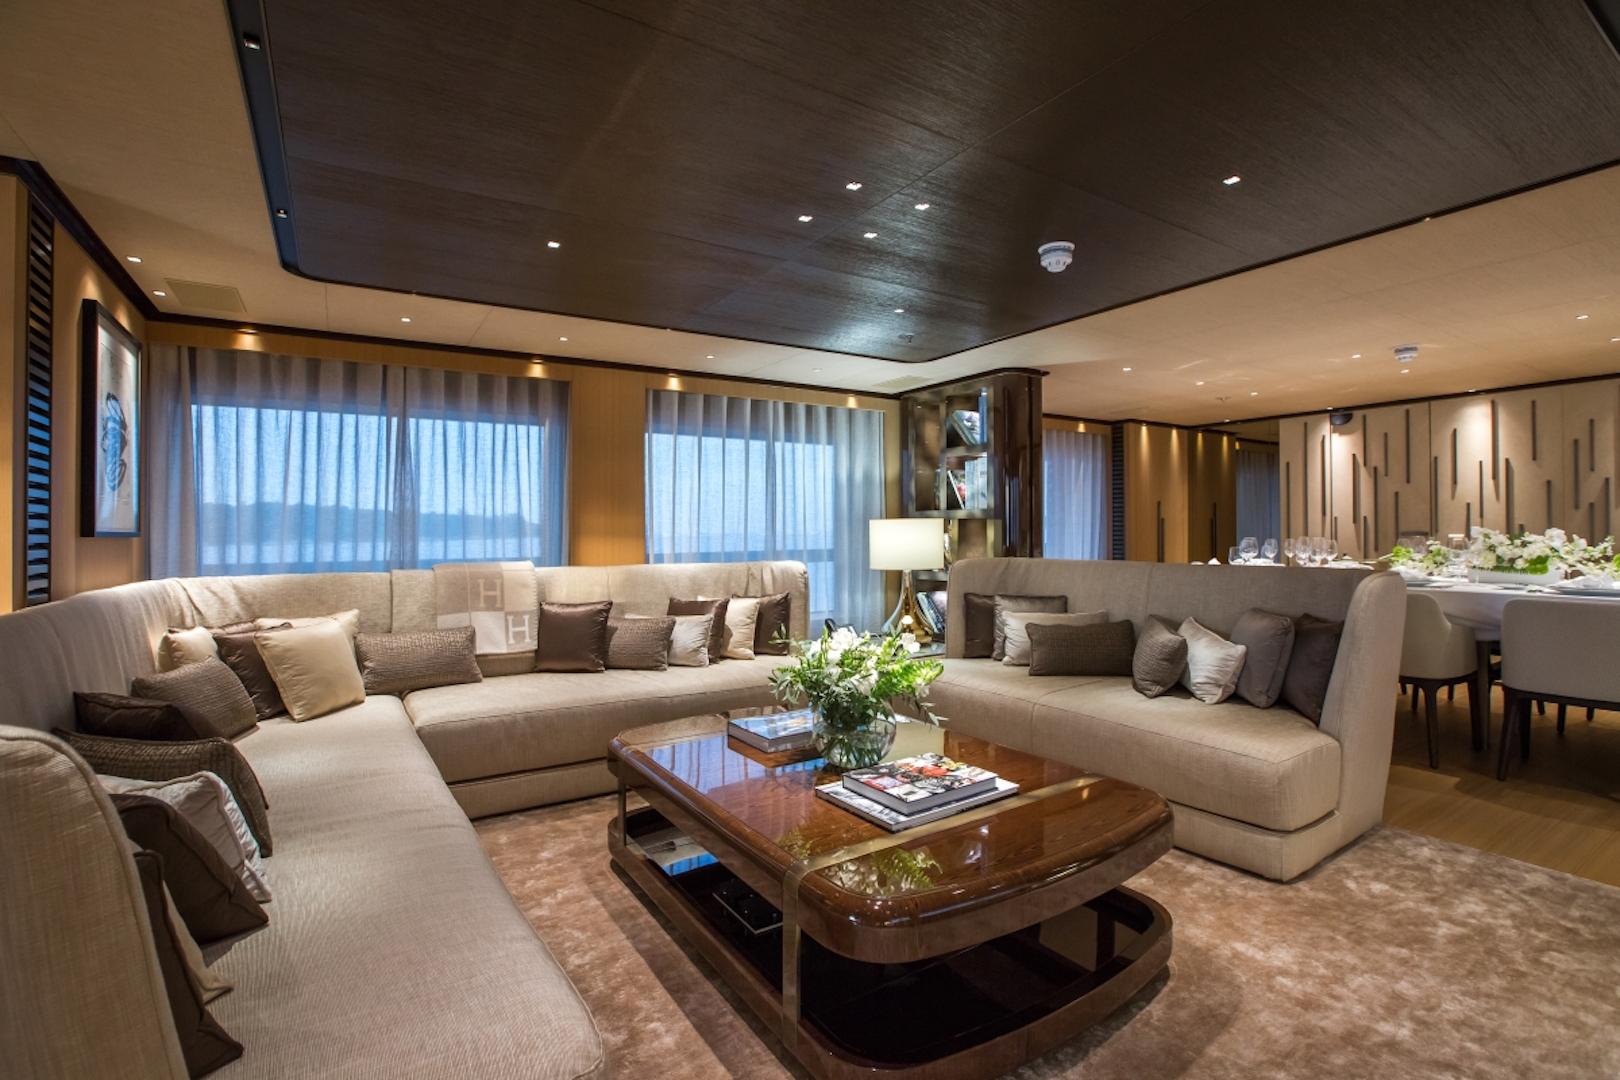 Motor Yacht VERTIGE - Main Salon And Formal Dining Area